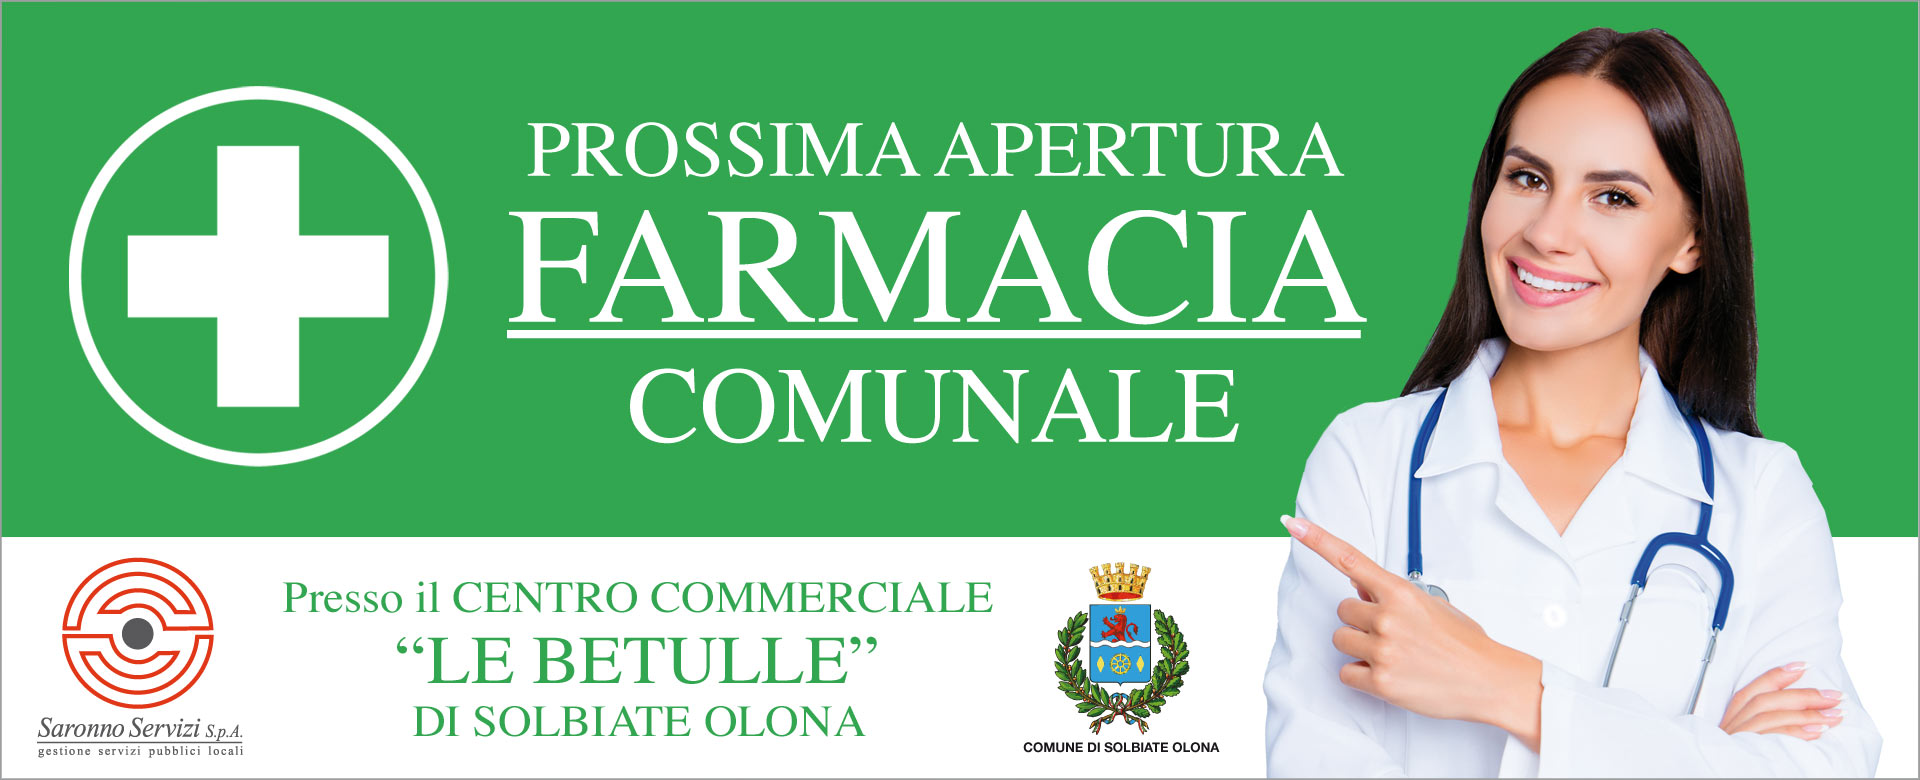 banner_farmacianuova